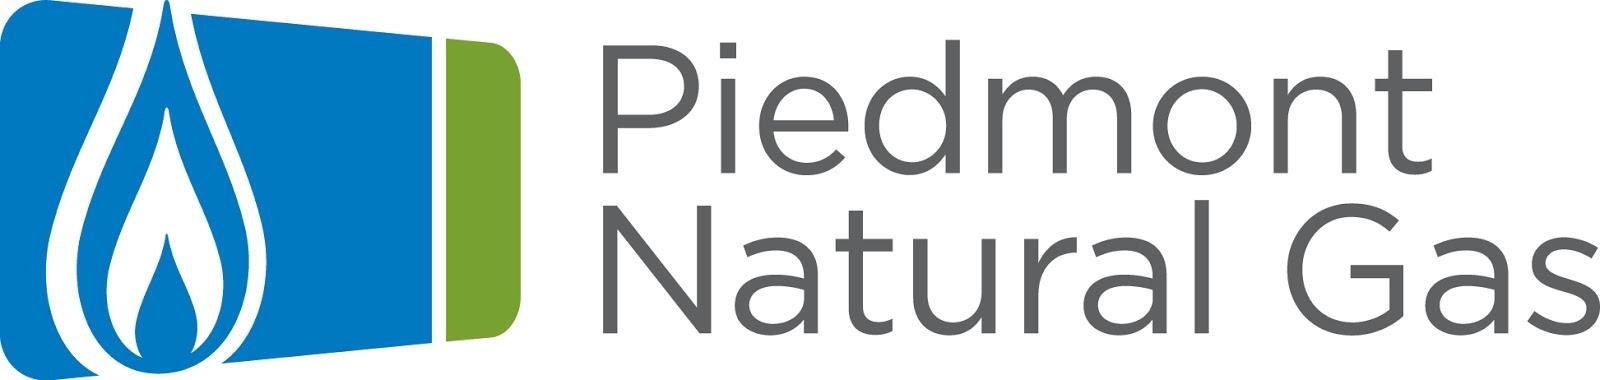 Piedmont Natural Gas Service Area